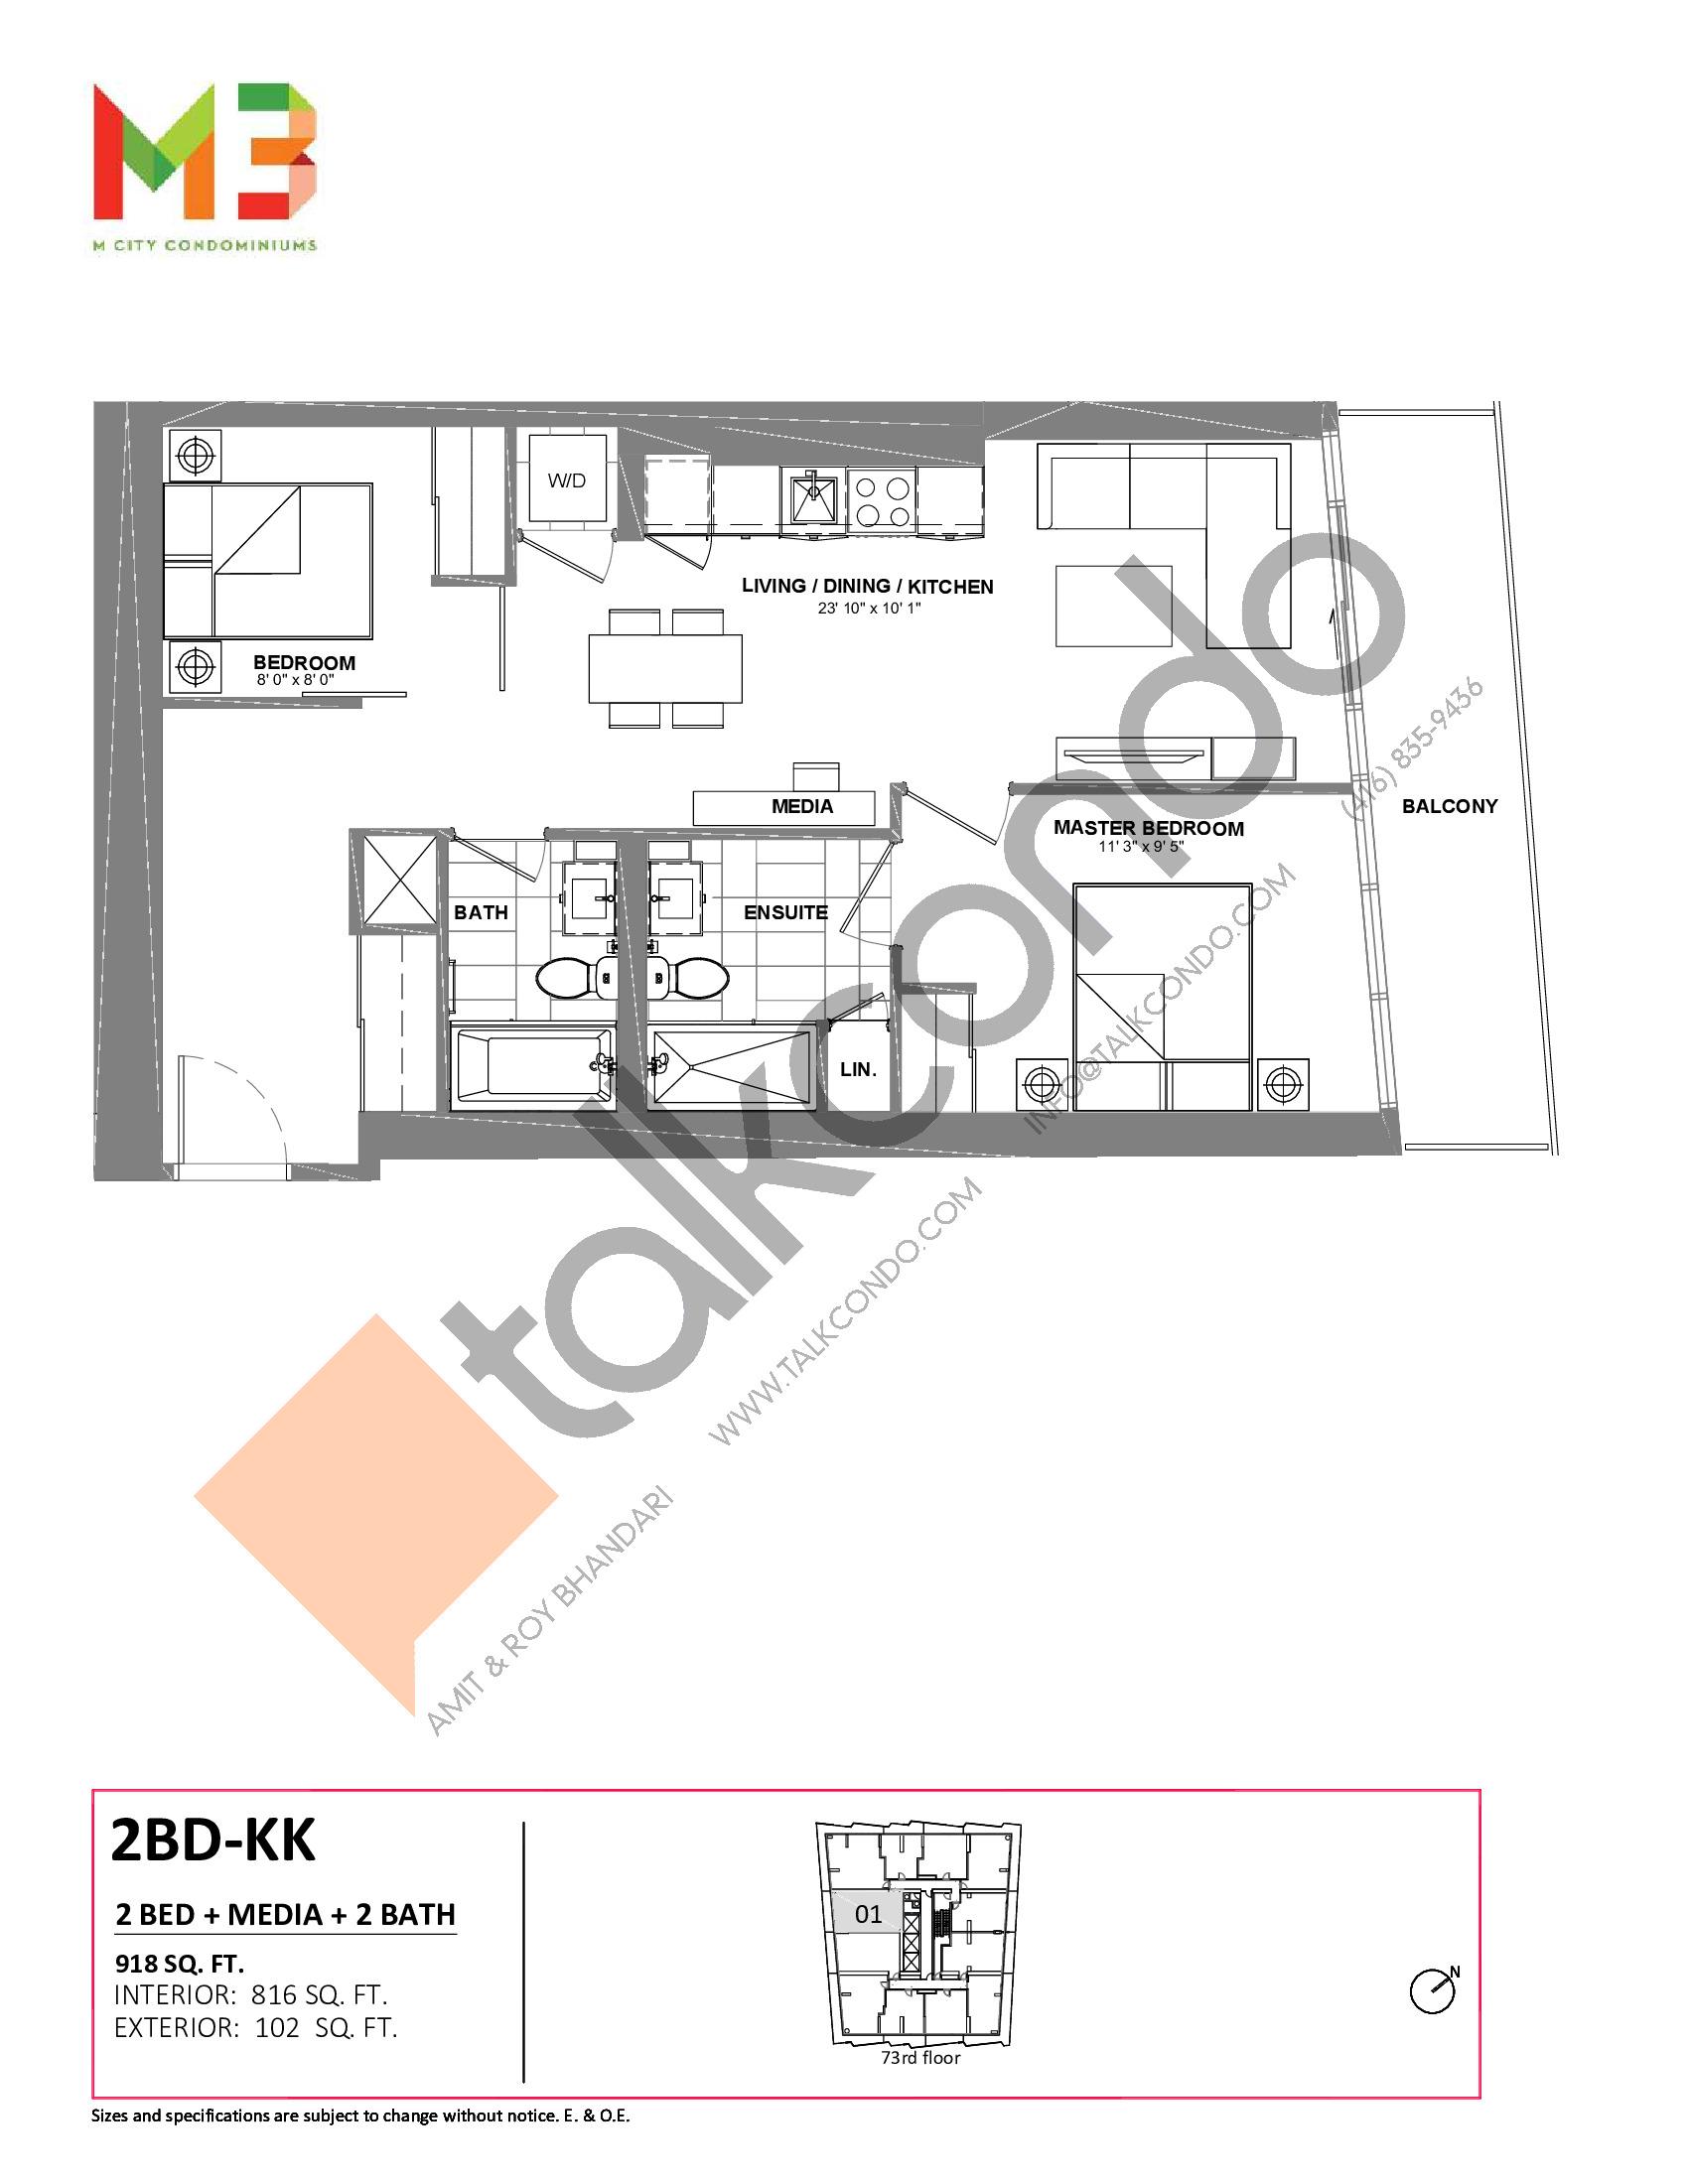 2BD-KK Floor Plan at M3 Condos - 816 sq.ft